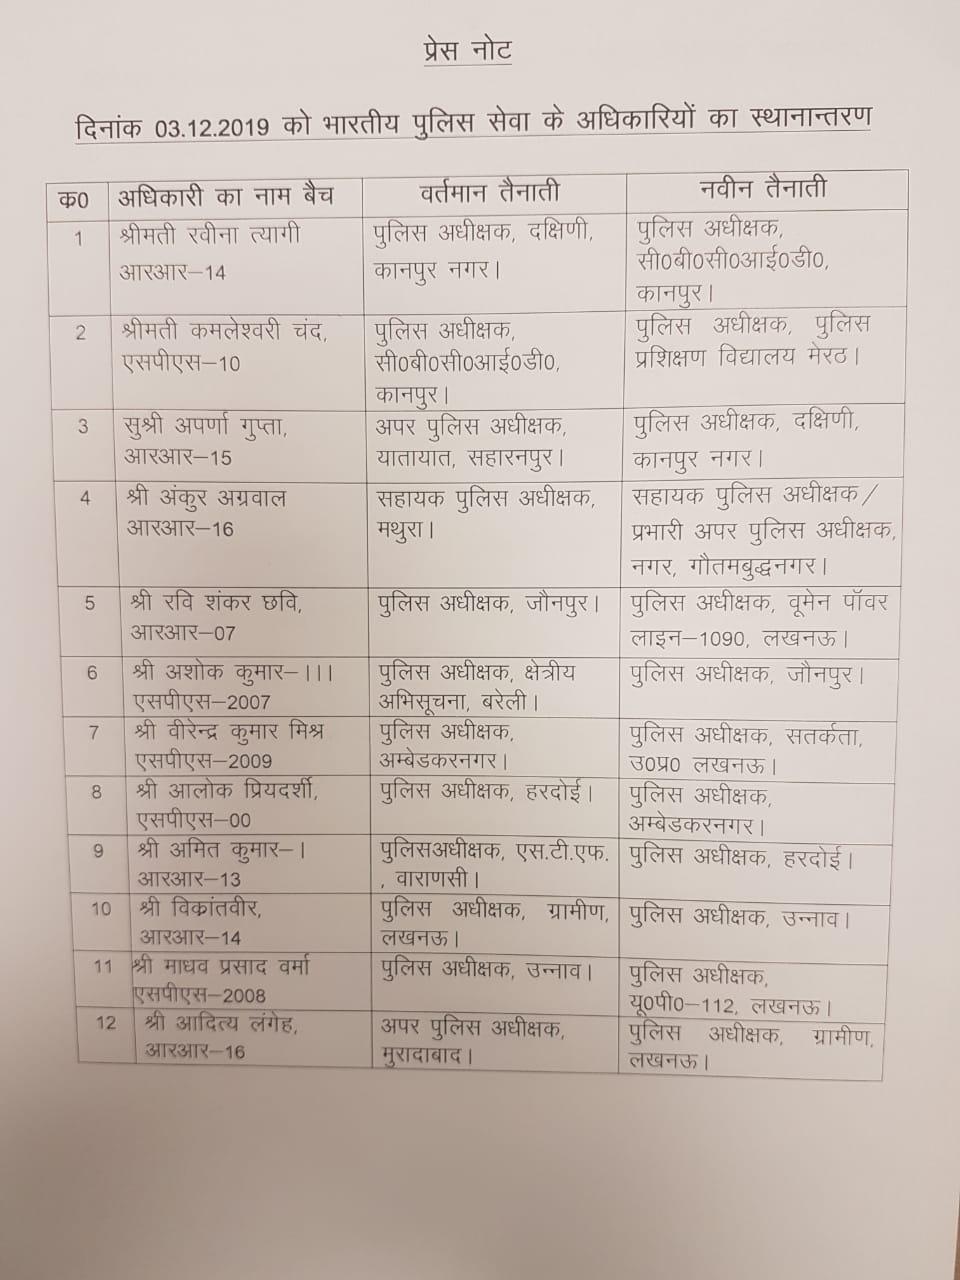 IPS Officials transferred